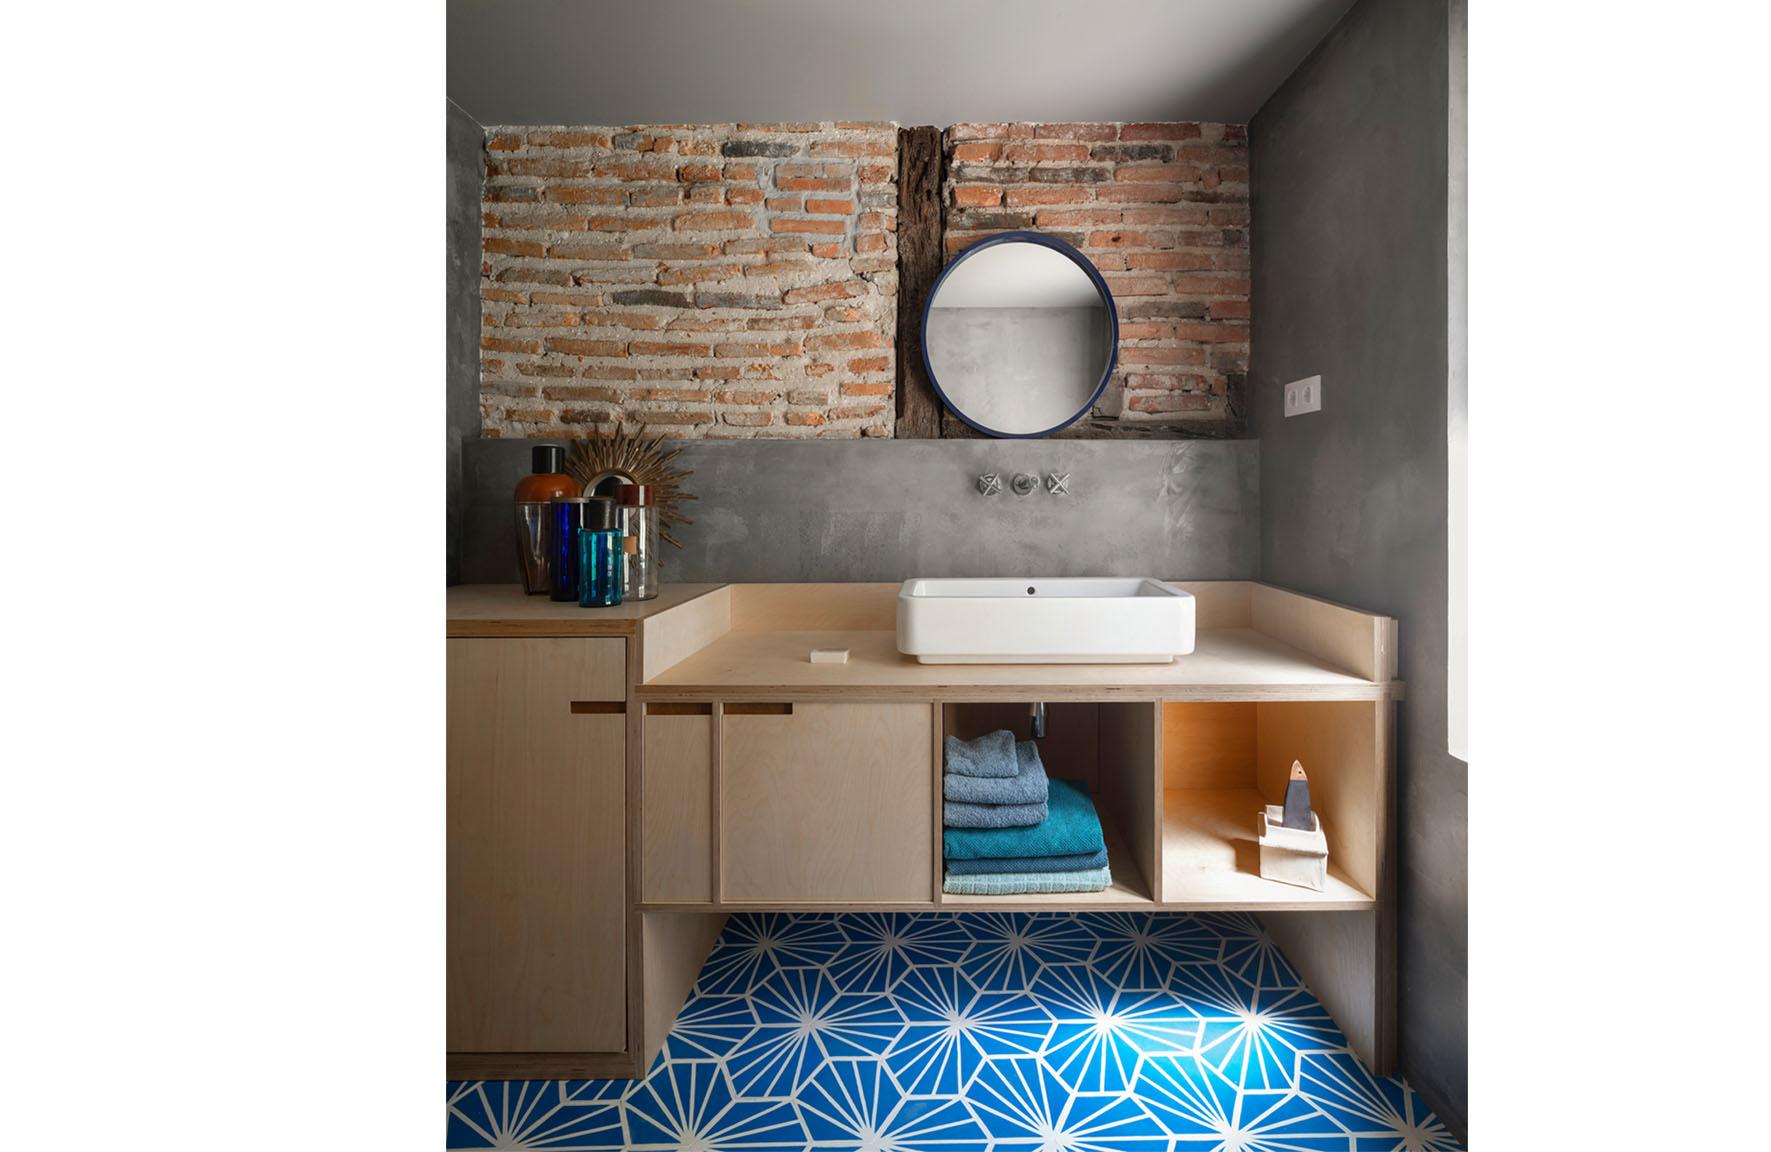 Apartment Esperanza-Bilbao-Image 06.jpg